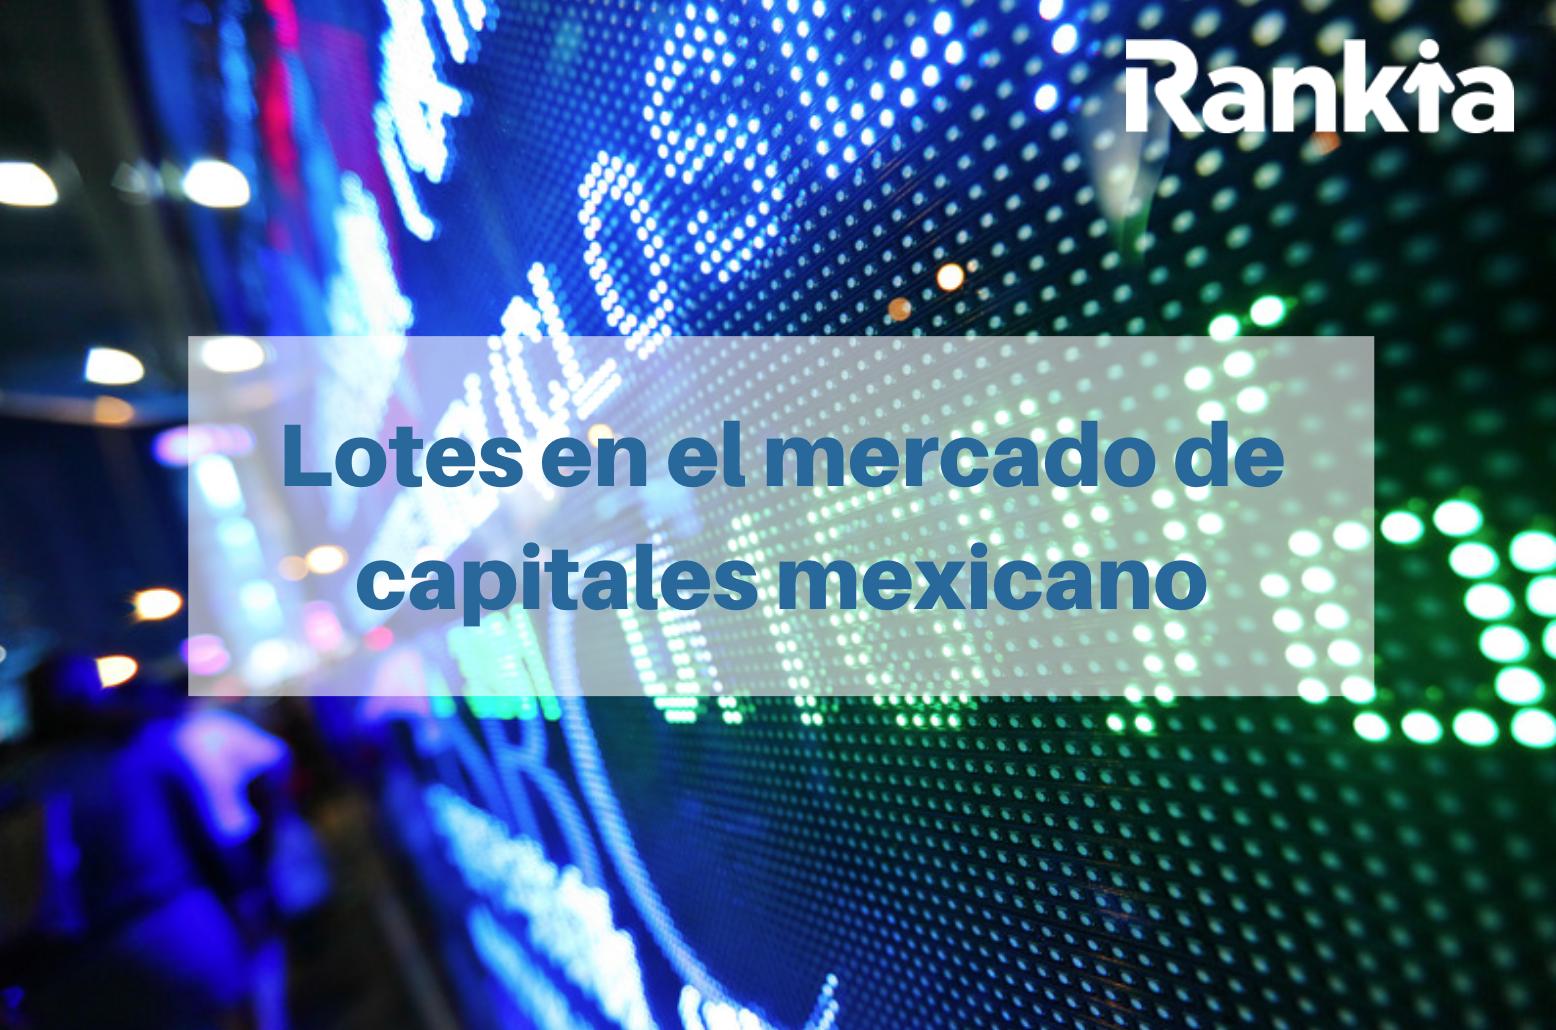 Lotes mercado de capitales